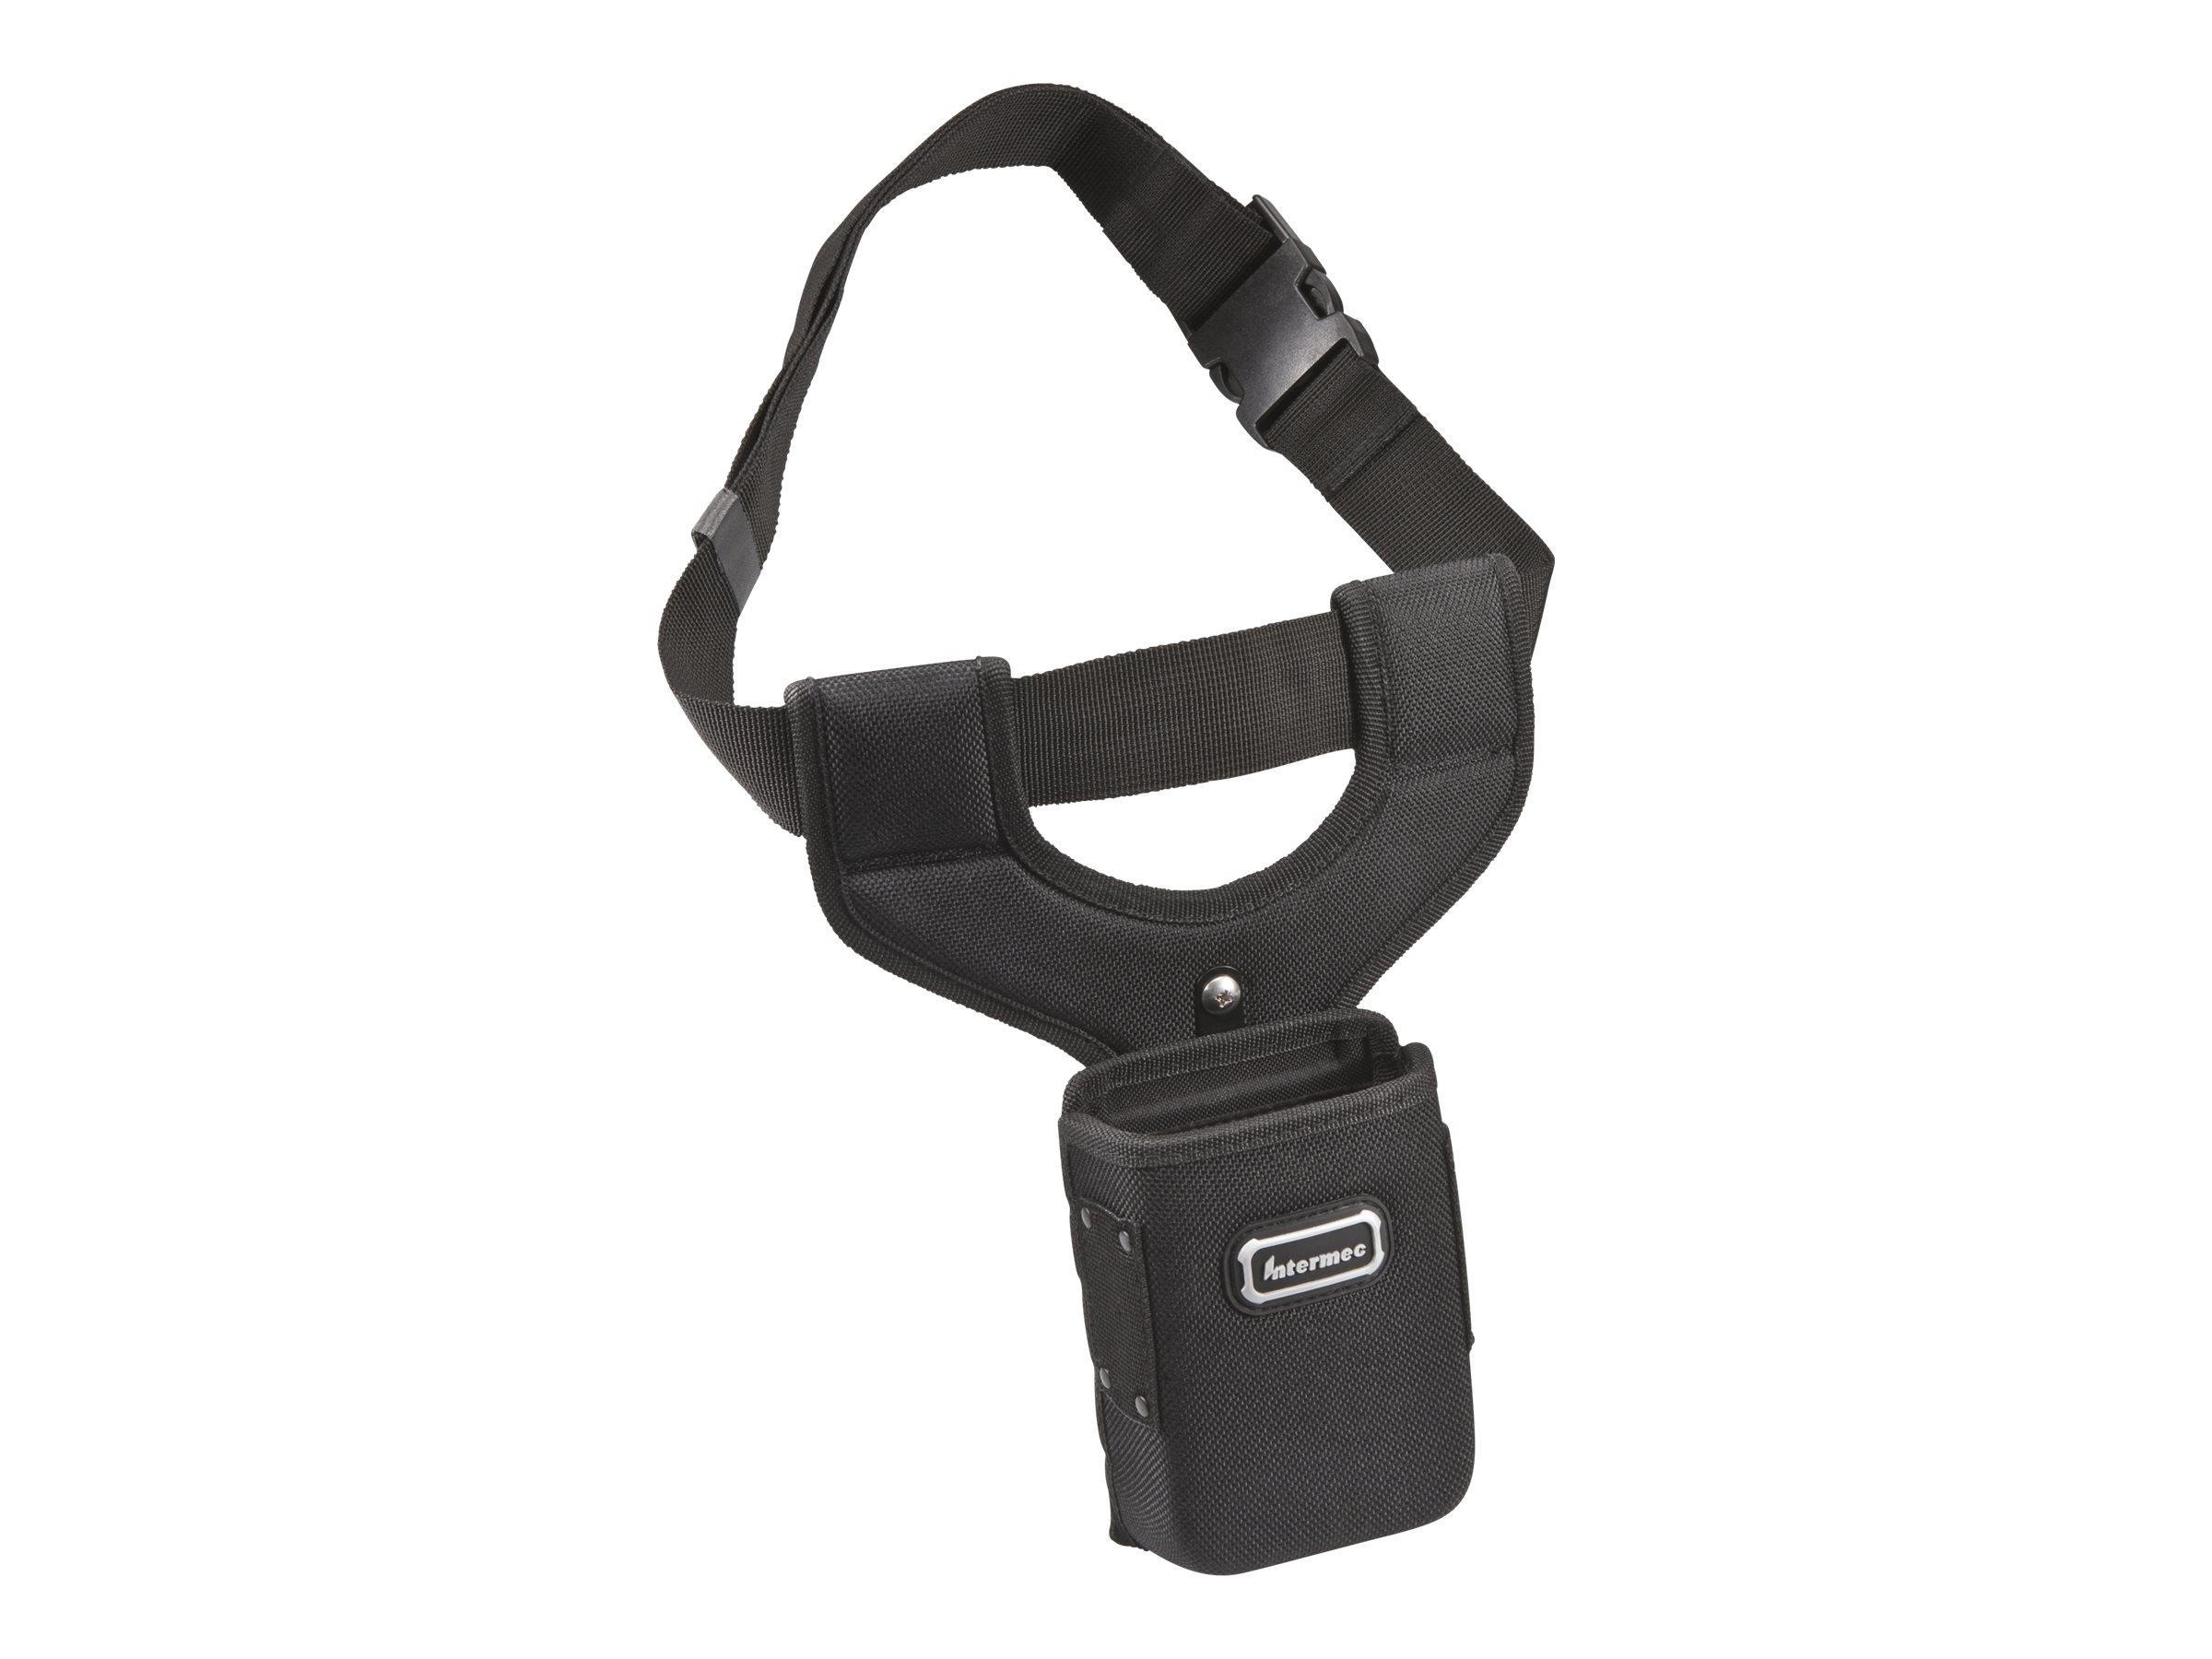 HONEYWELL Handheld-Holster - für Intermec CN70